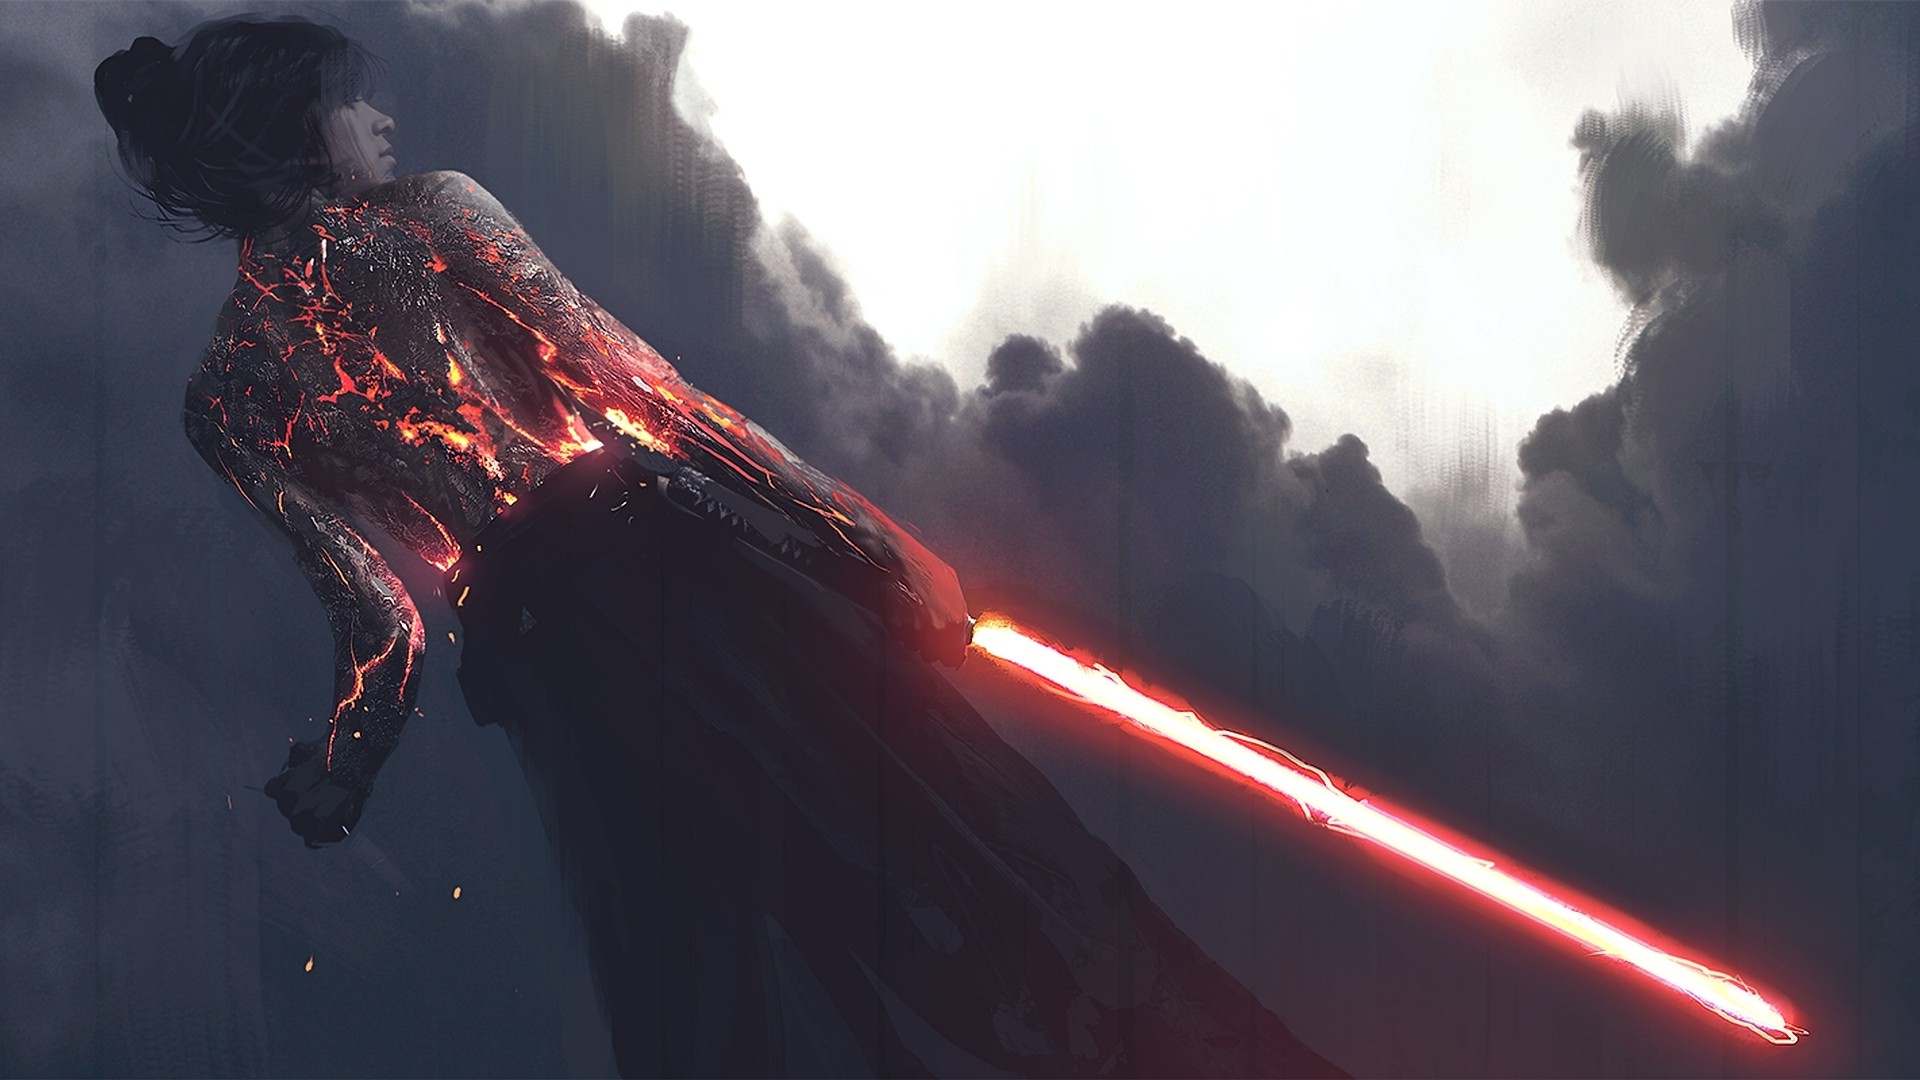 Star Wars Sith Wallpaper Hd , HD Wallpaper & Backgrounds